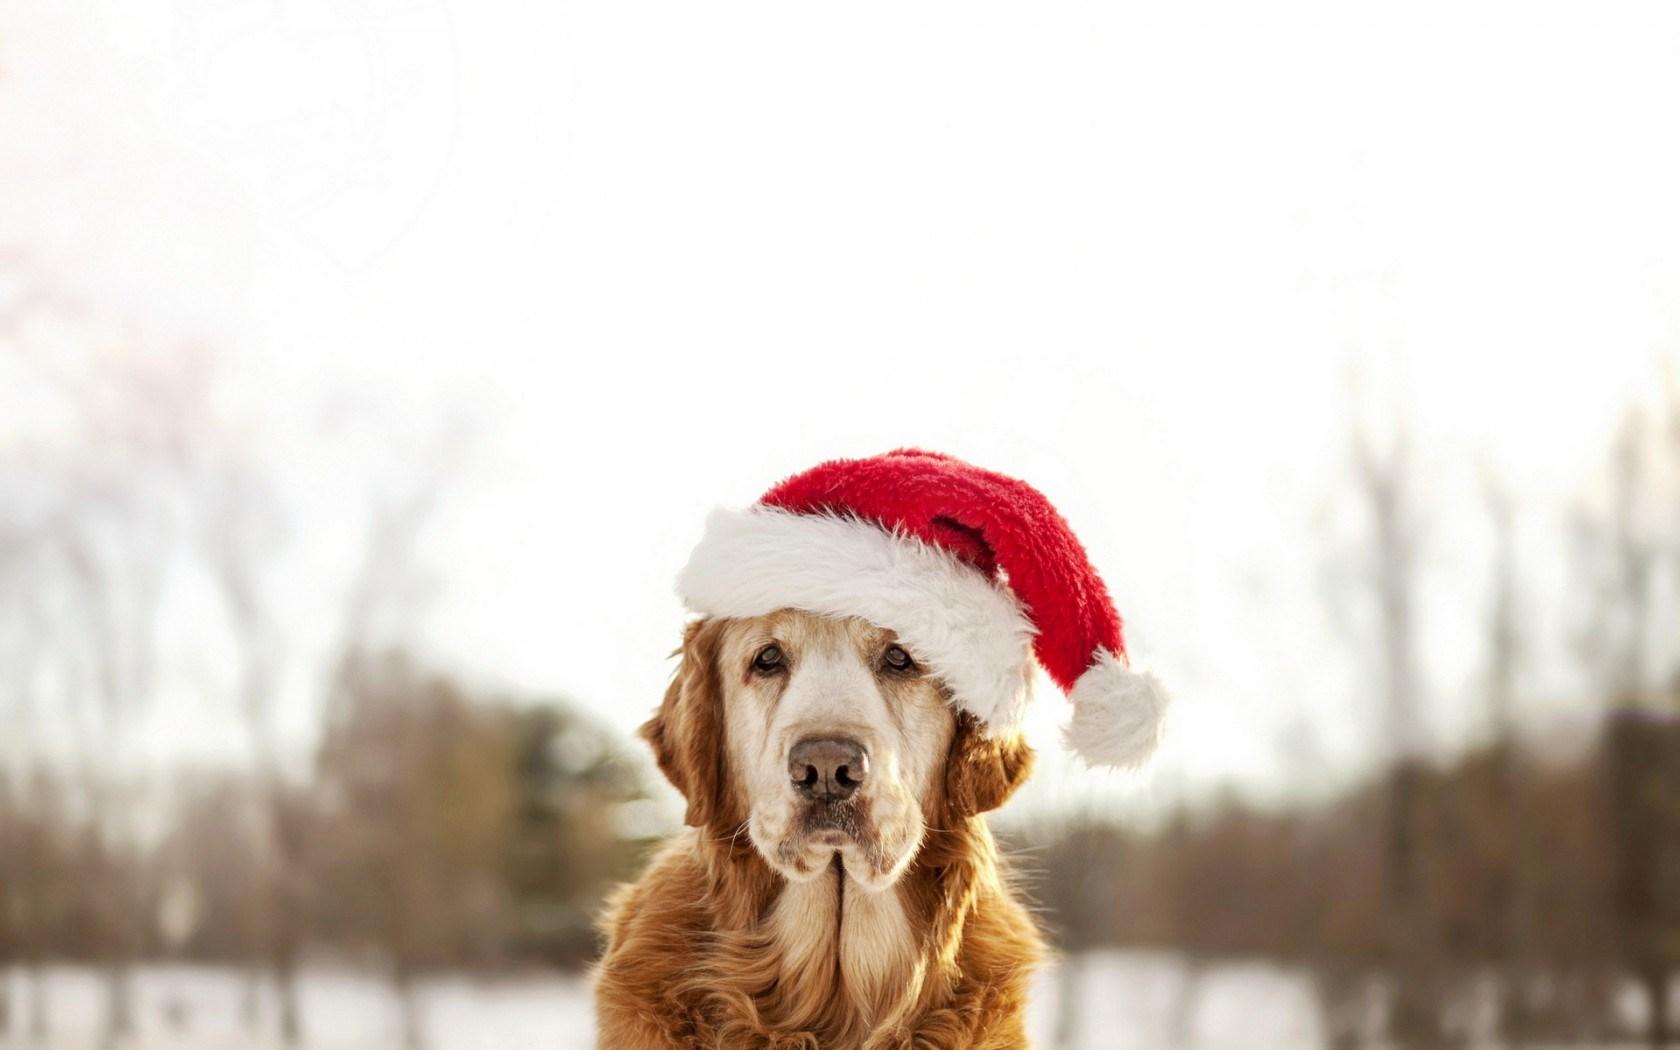 Fondos animados navidad para pc | fondos de pantalla.